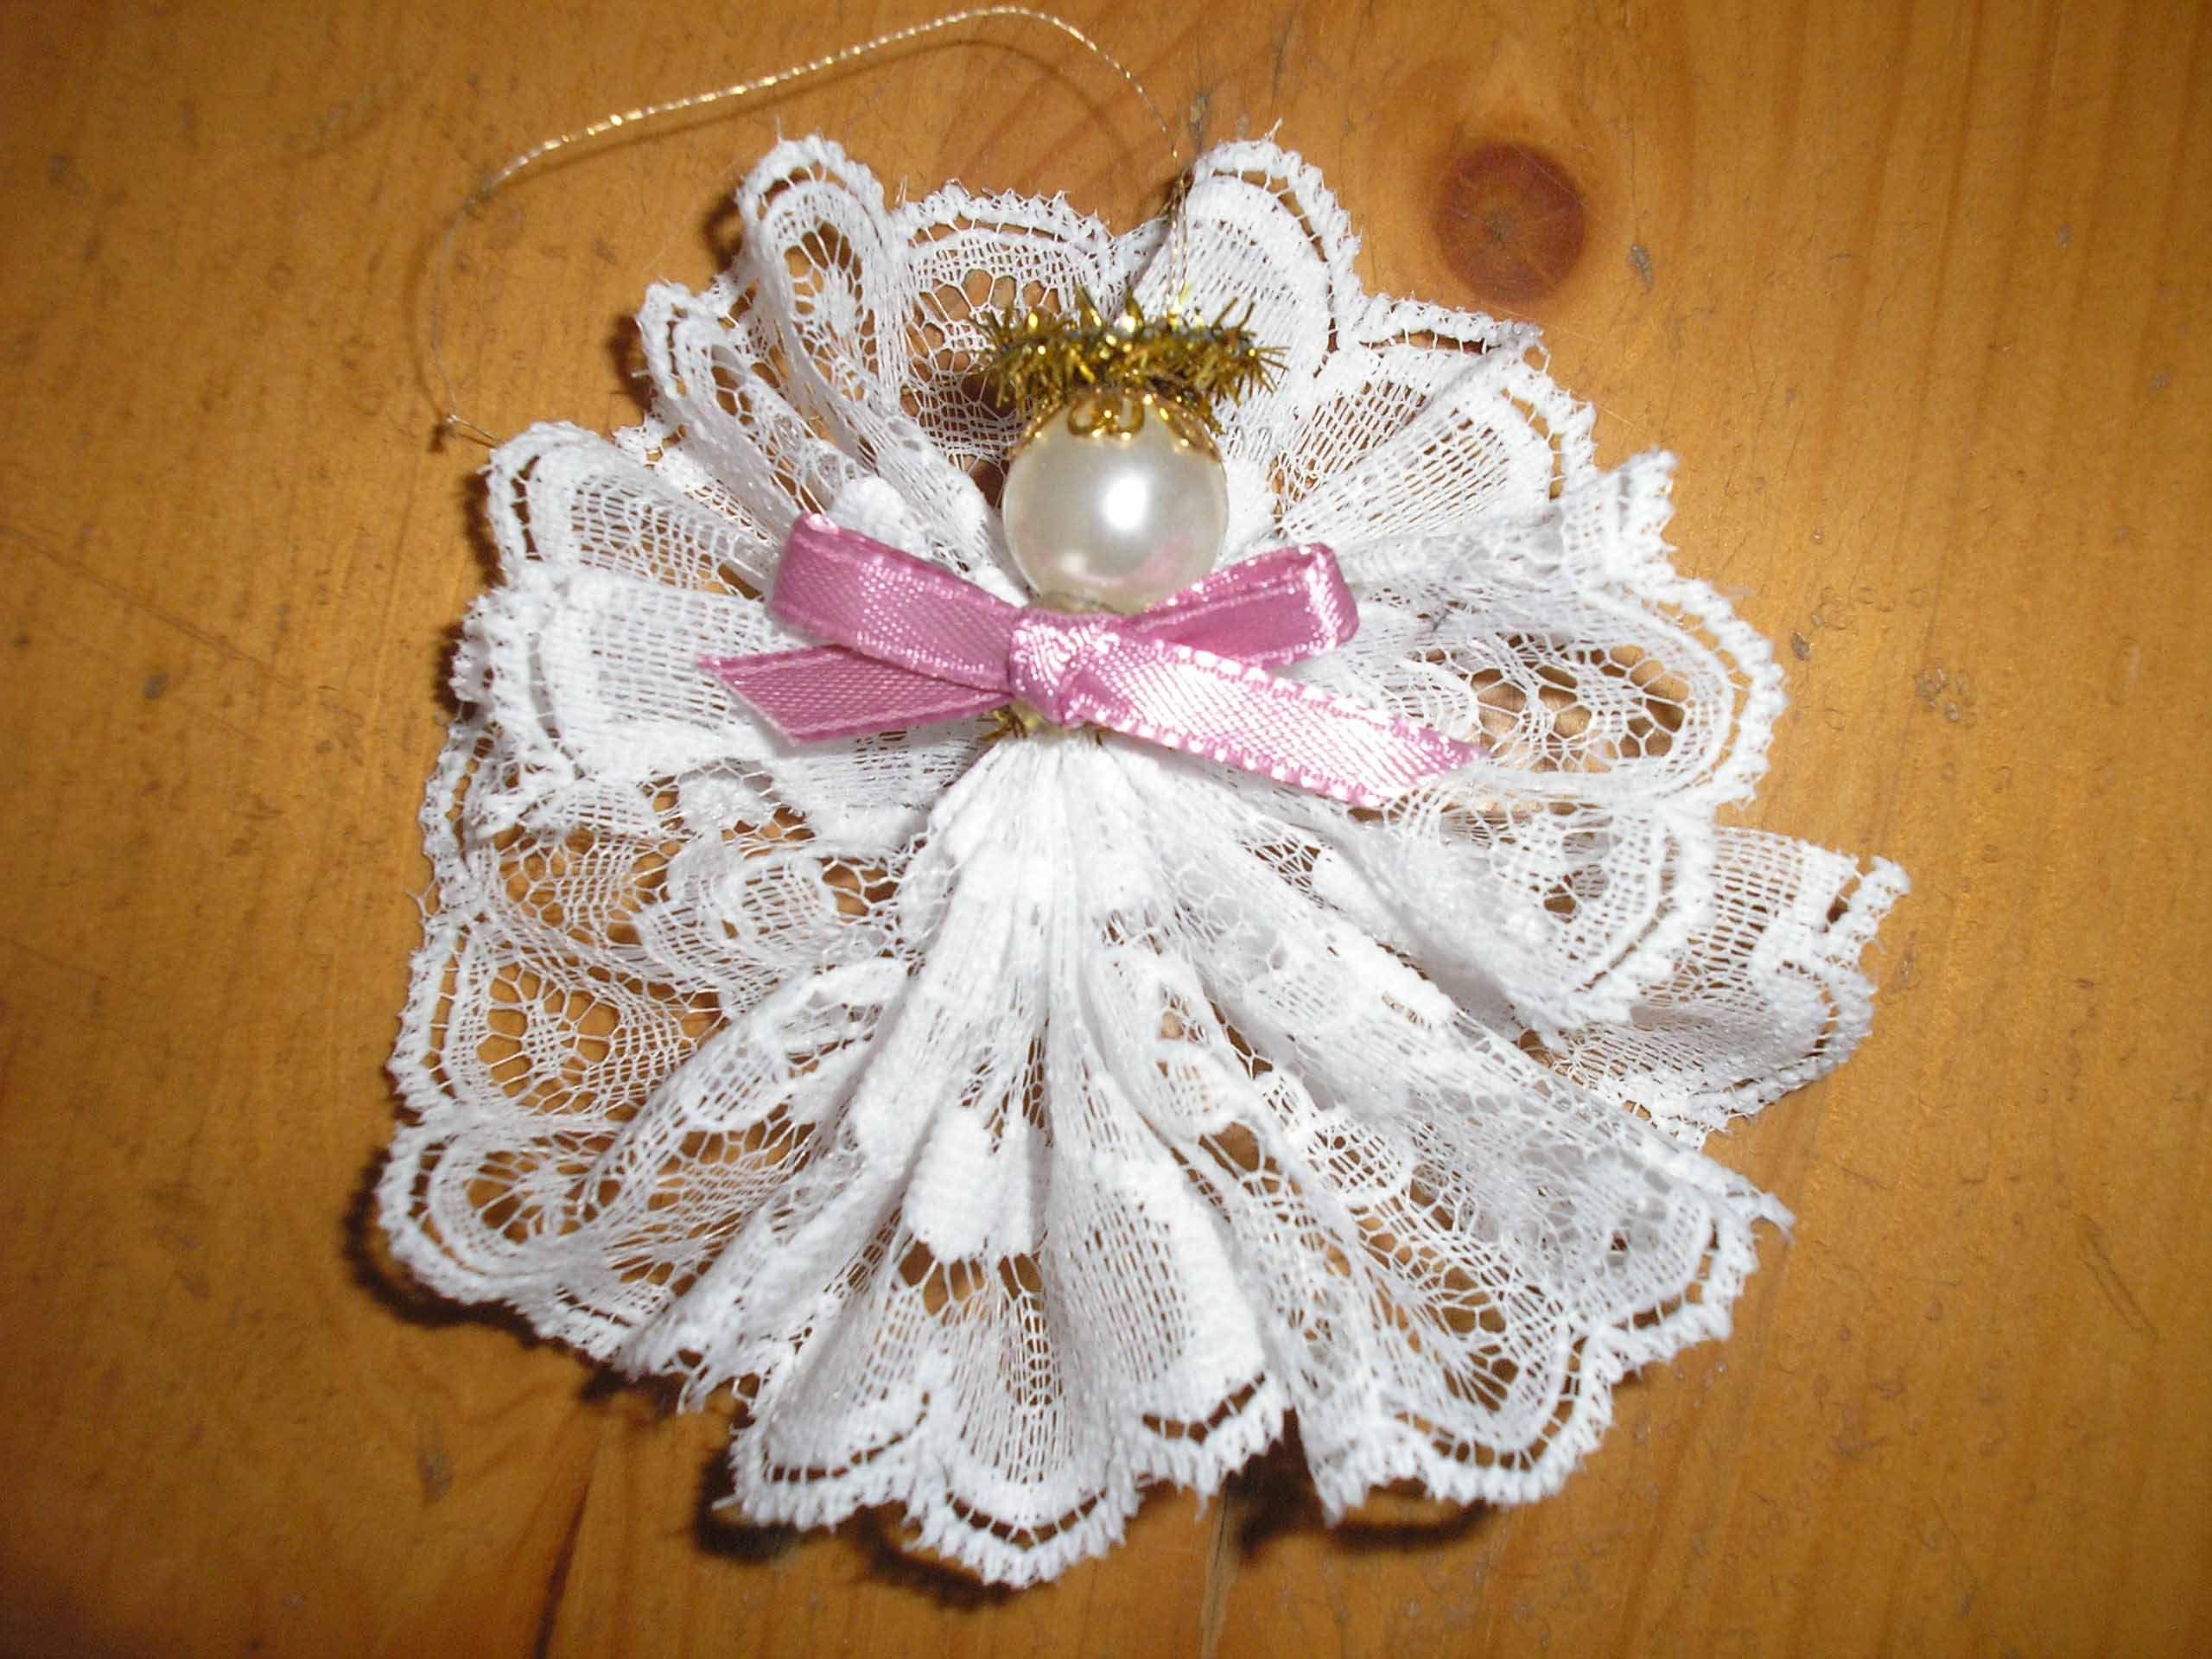 Lace Angel Ornament Christmas Angel Ornaments Handmade Diy Quilted Christmas Ornaments Christmas Angel Ornaments